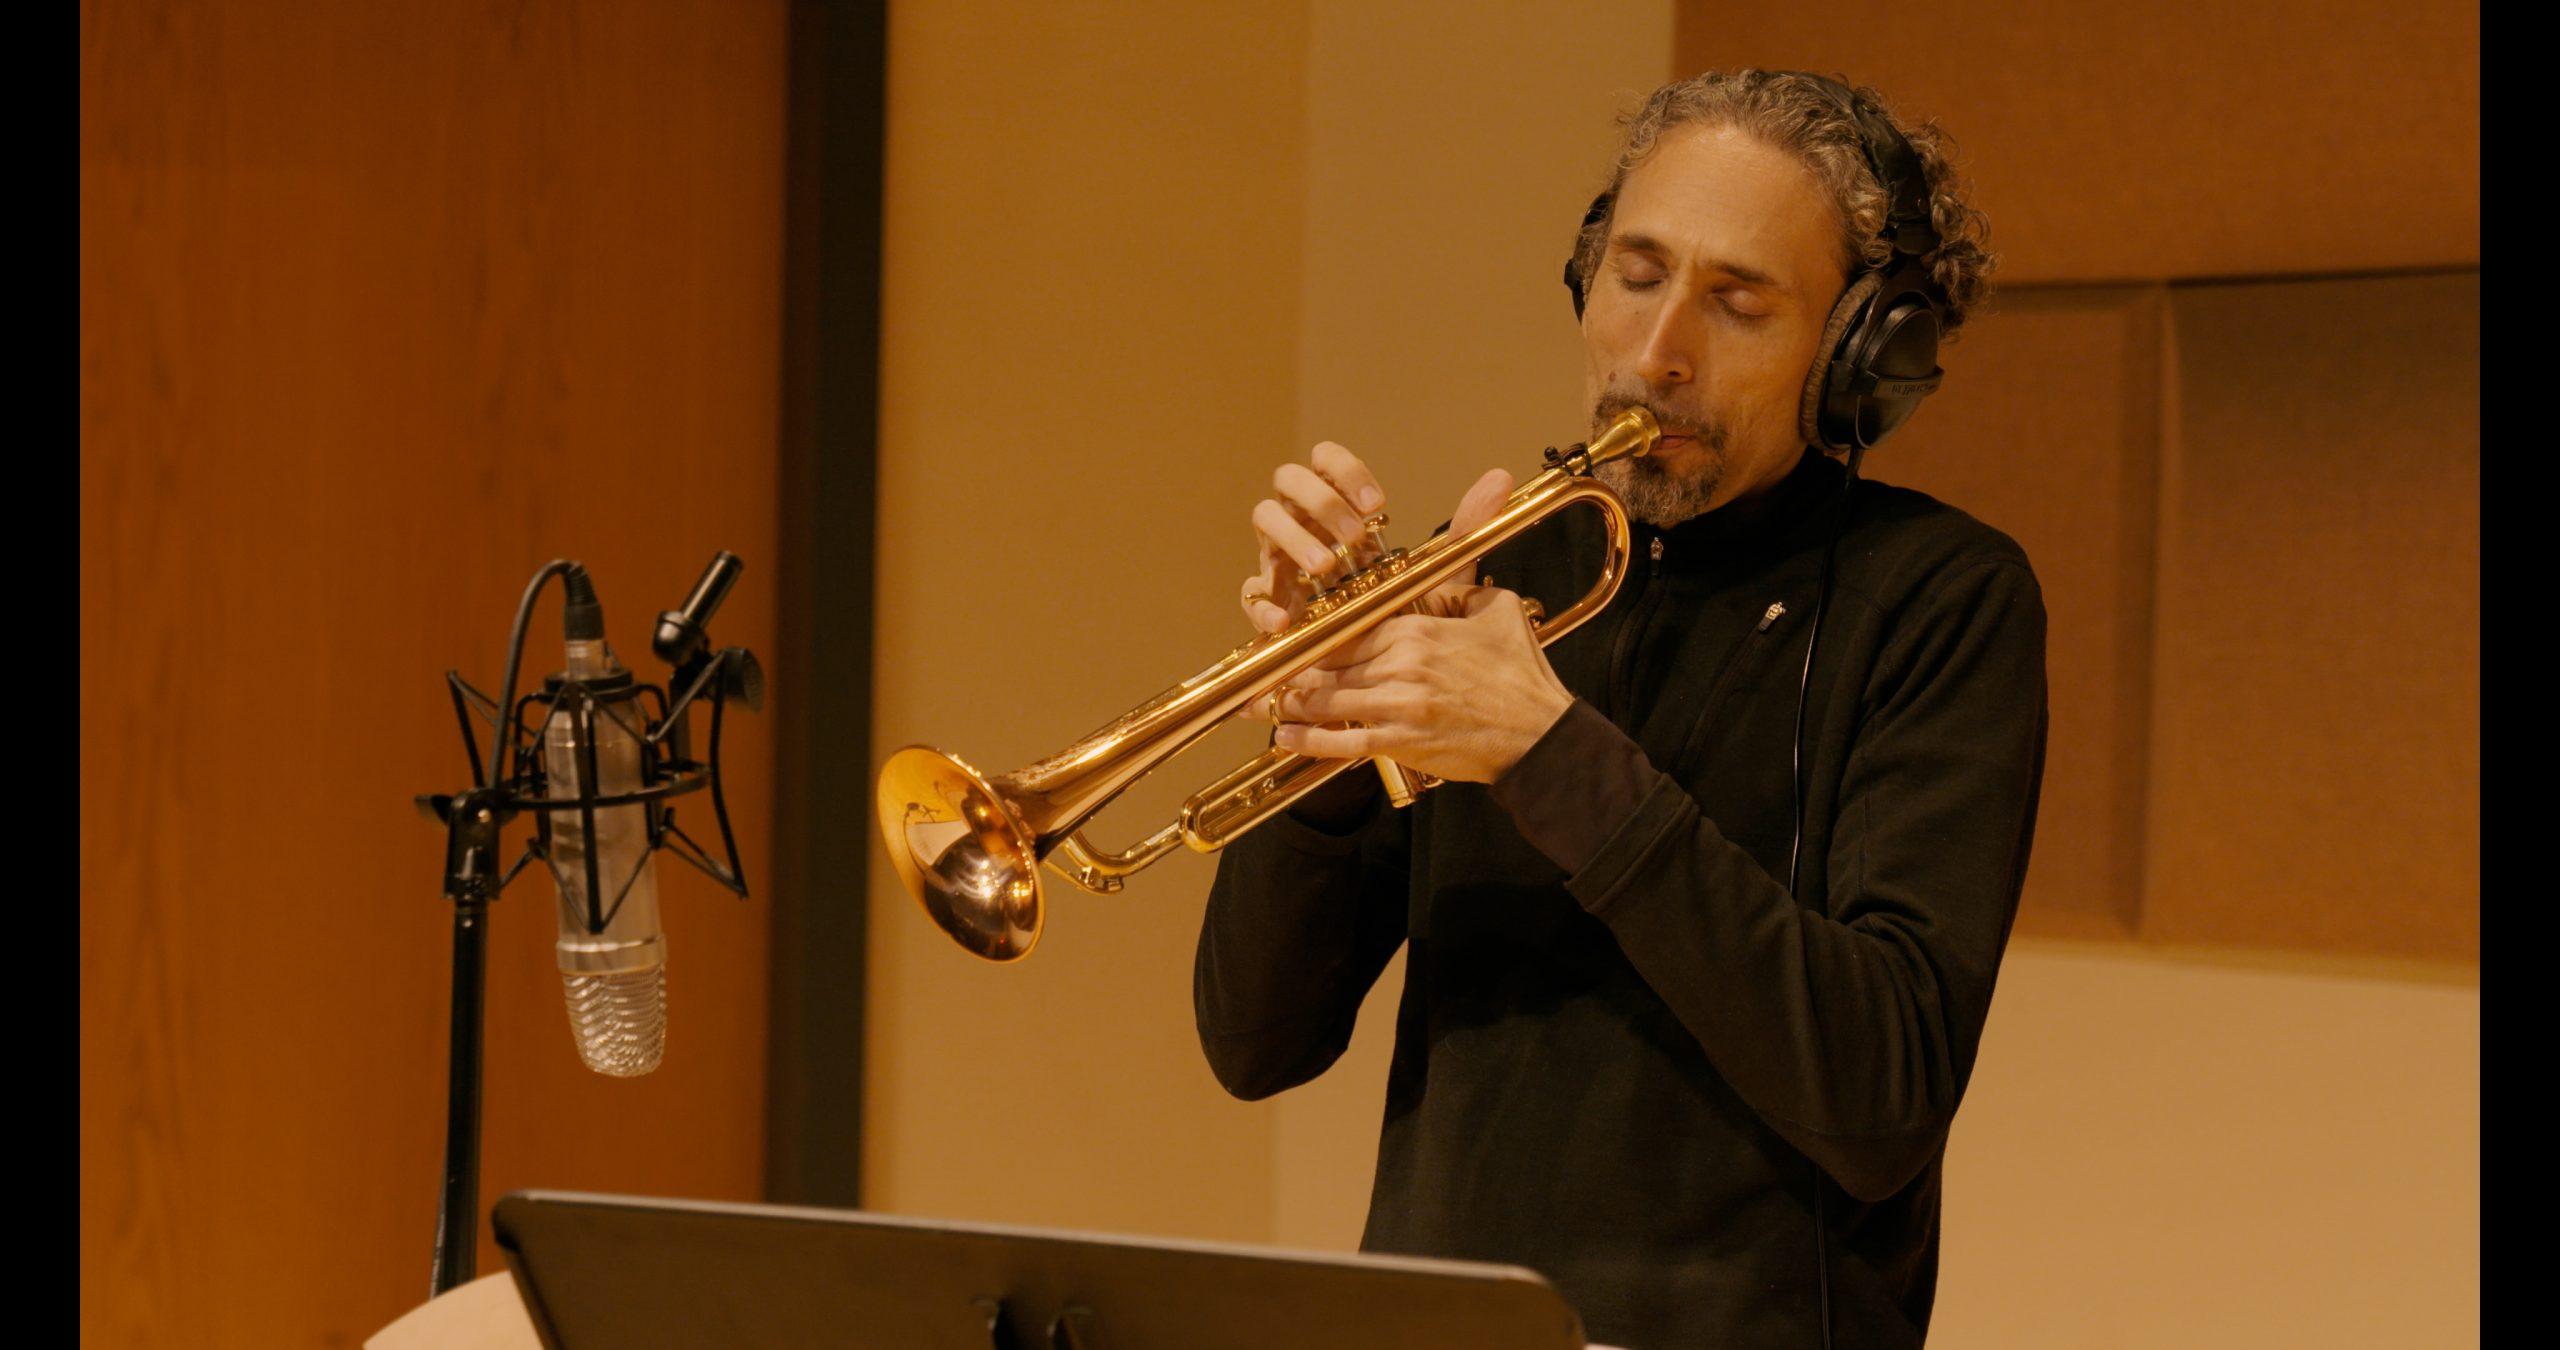 Trumpeter John Daversa performing during a recording session.